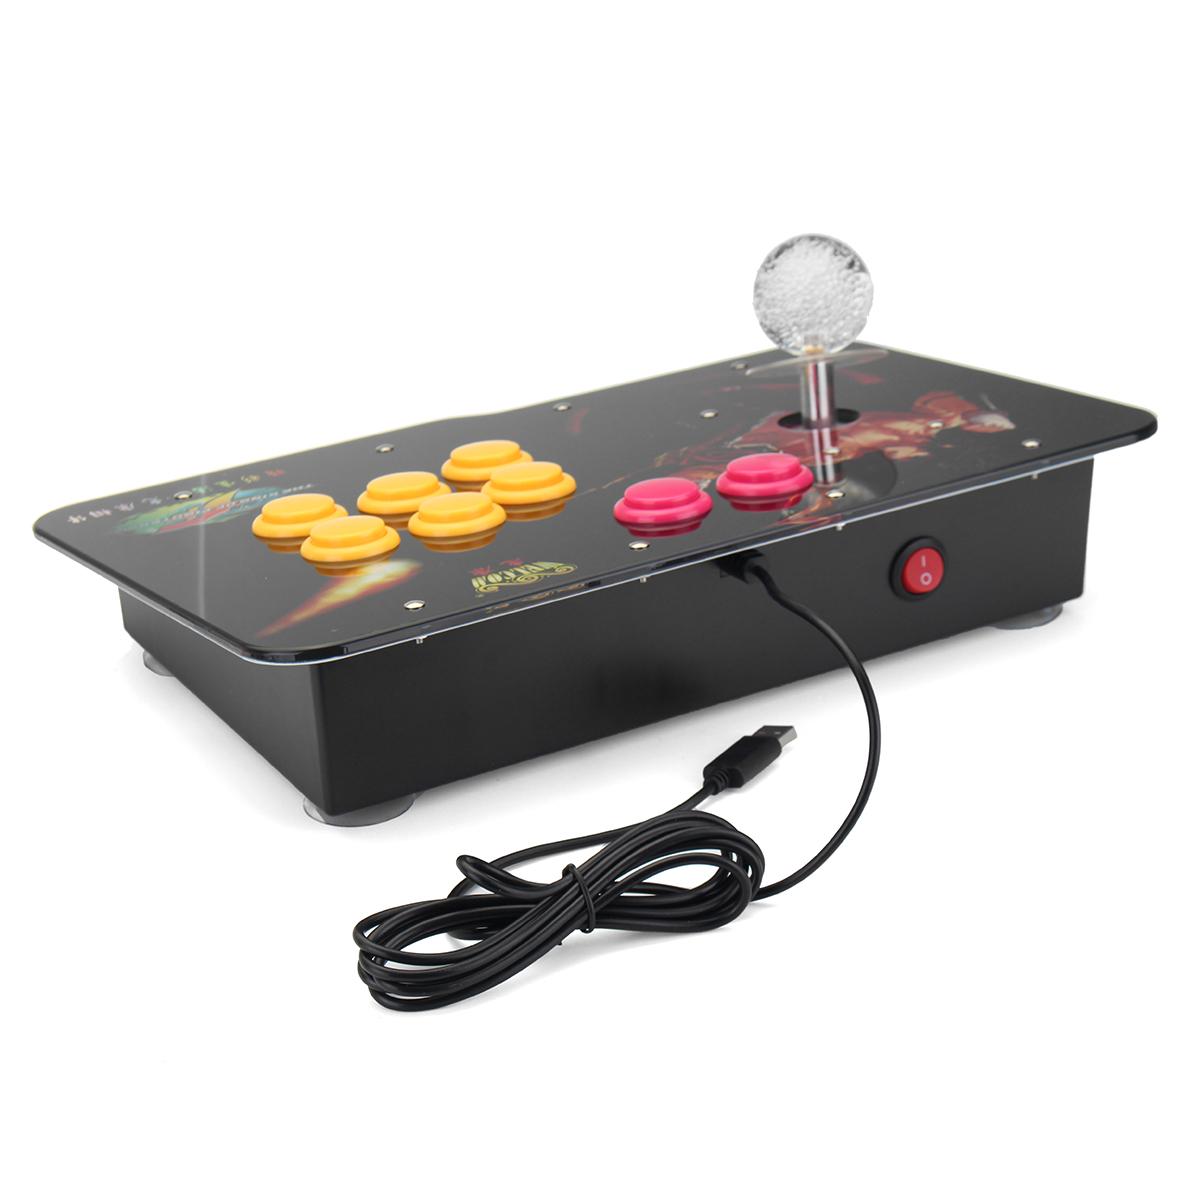 Arcade Stick Video Game LED Light USB Joystick Controller Rocker For PC Phone